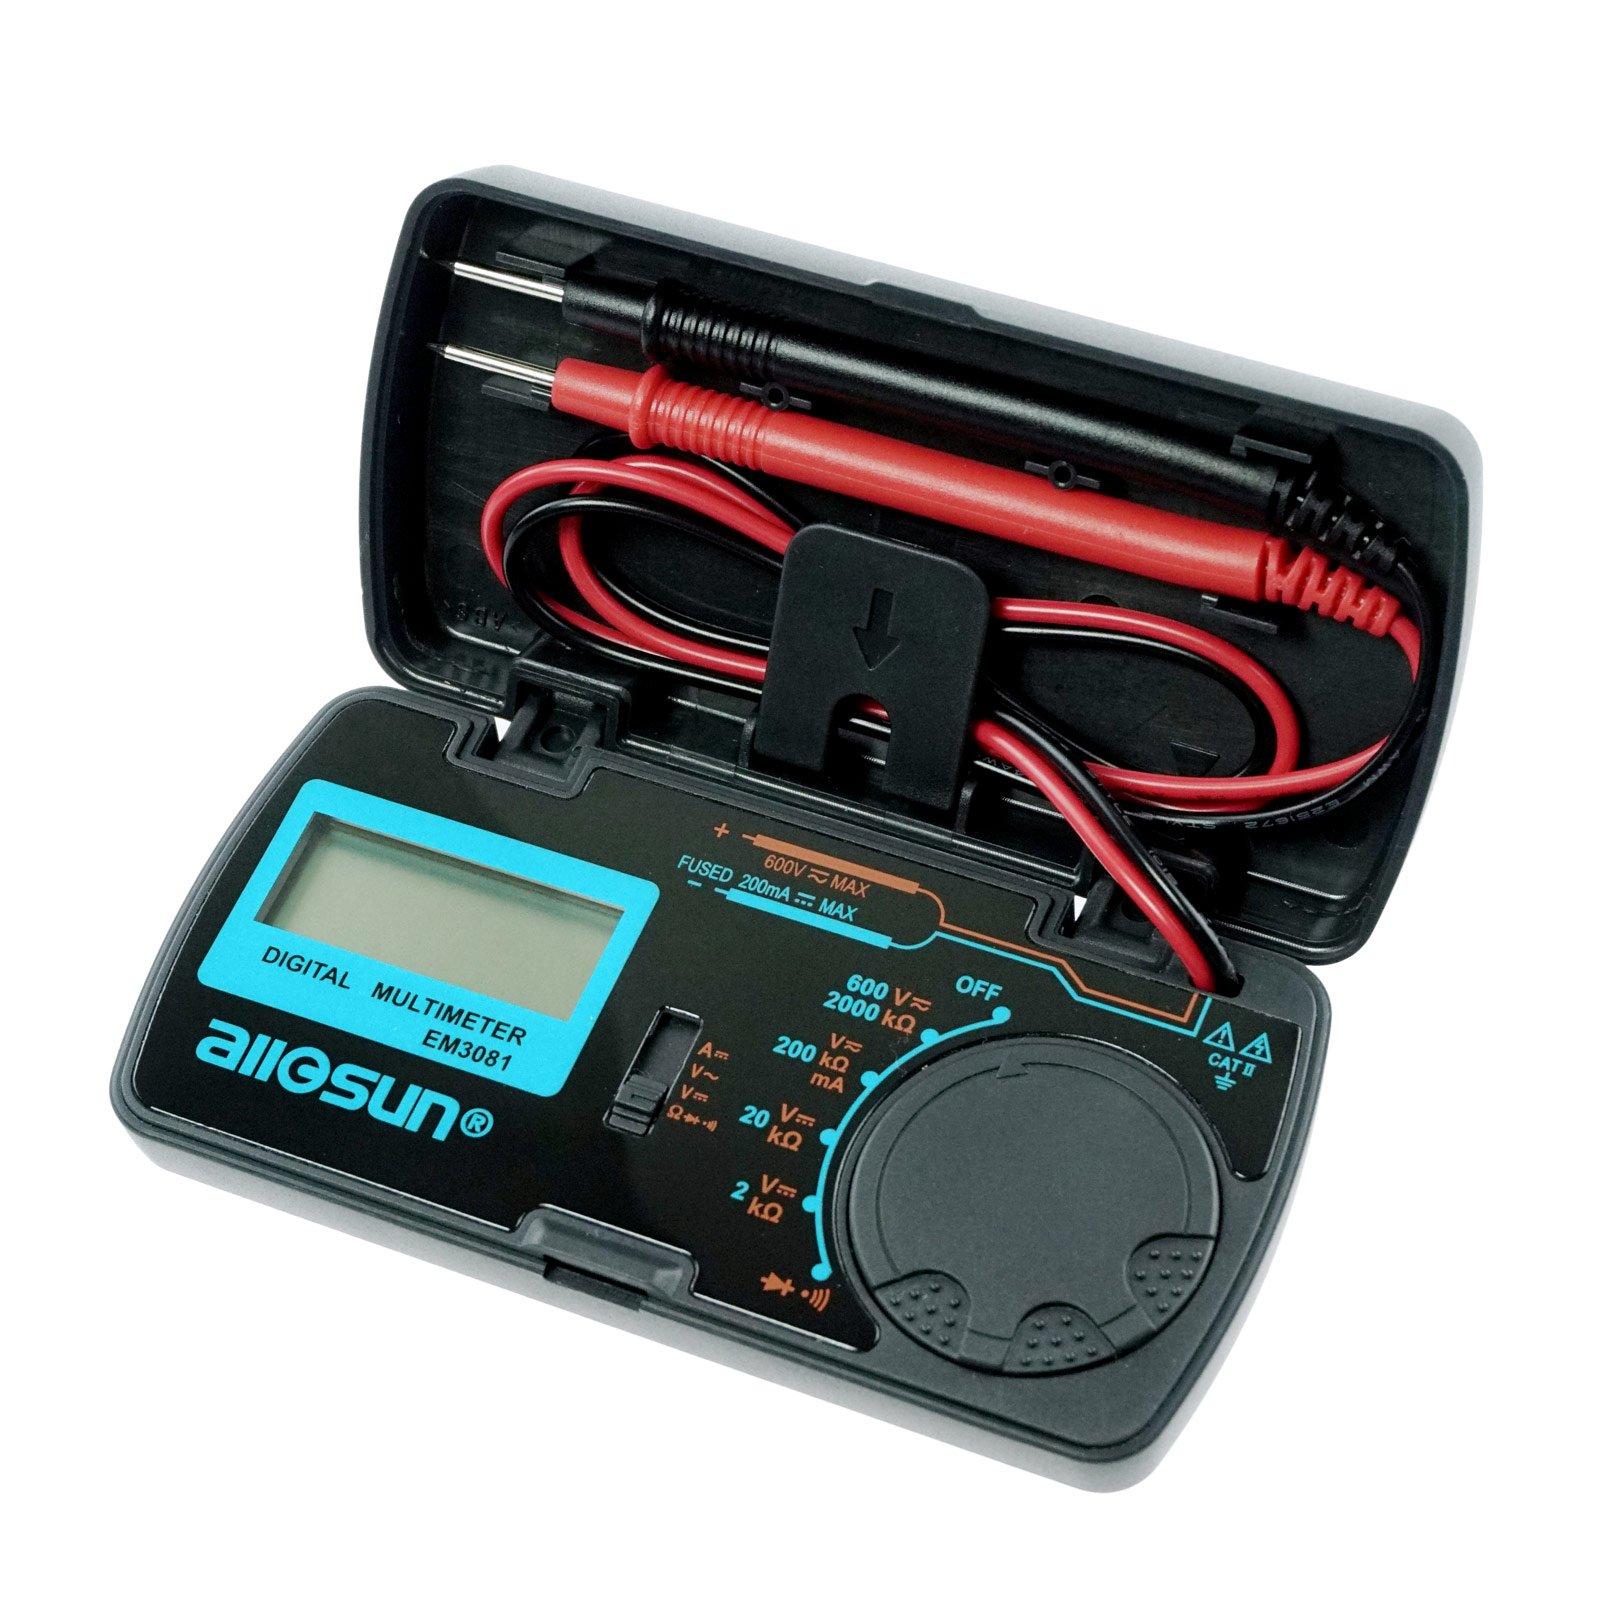 allsun Digital Multimeter Mini 6 Functions Handheld Folding Digital Multimeter 3-1 2 Digit Pocket DMM DC/AC Voltmeter DC Ammeter Ohm Continuity Diode Testing Tone Tester